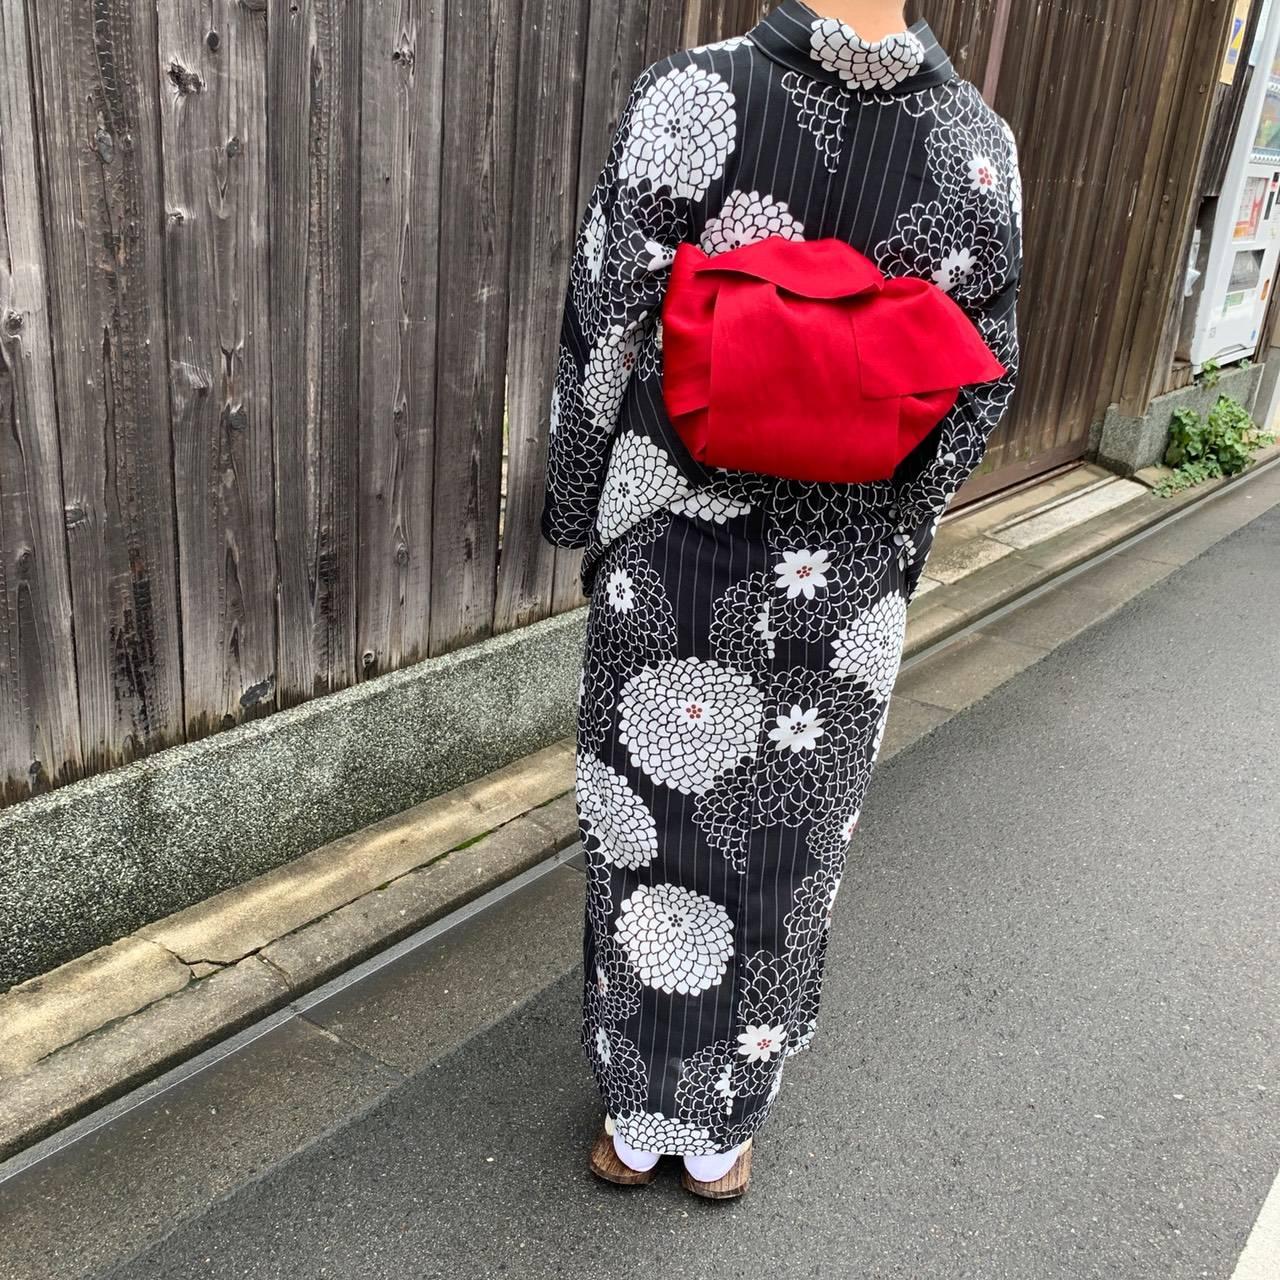 「蝶矢」梅酒作り体験2019年8月30日3